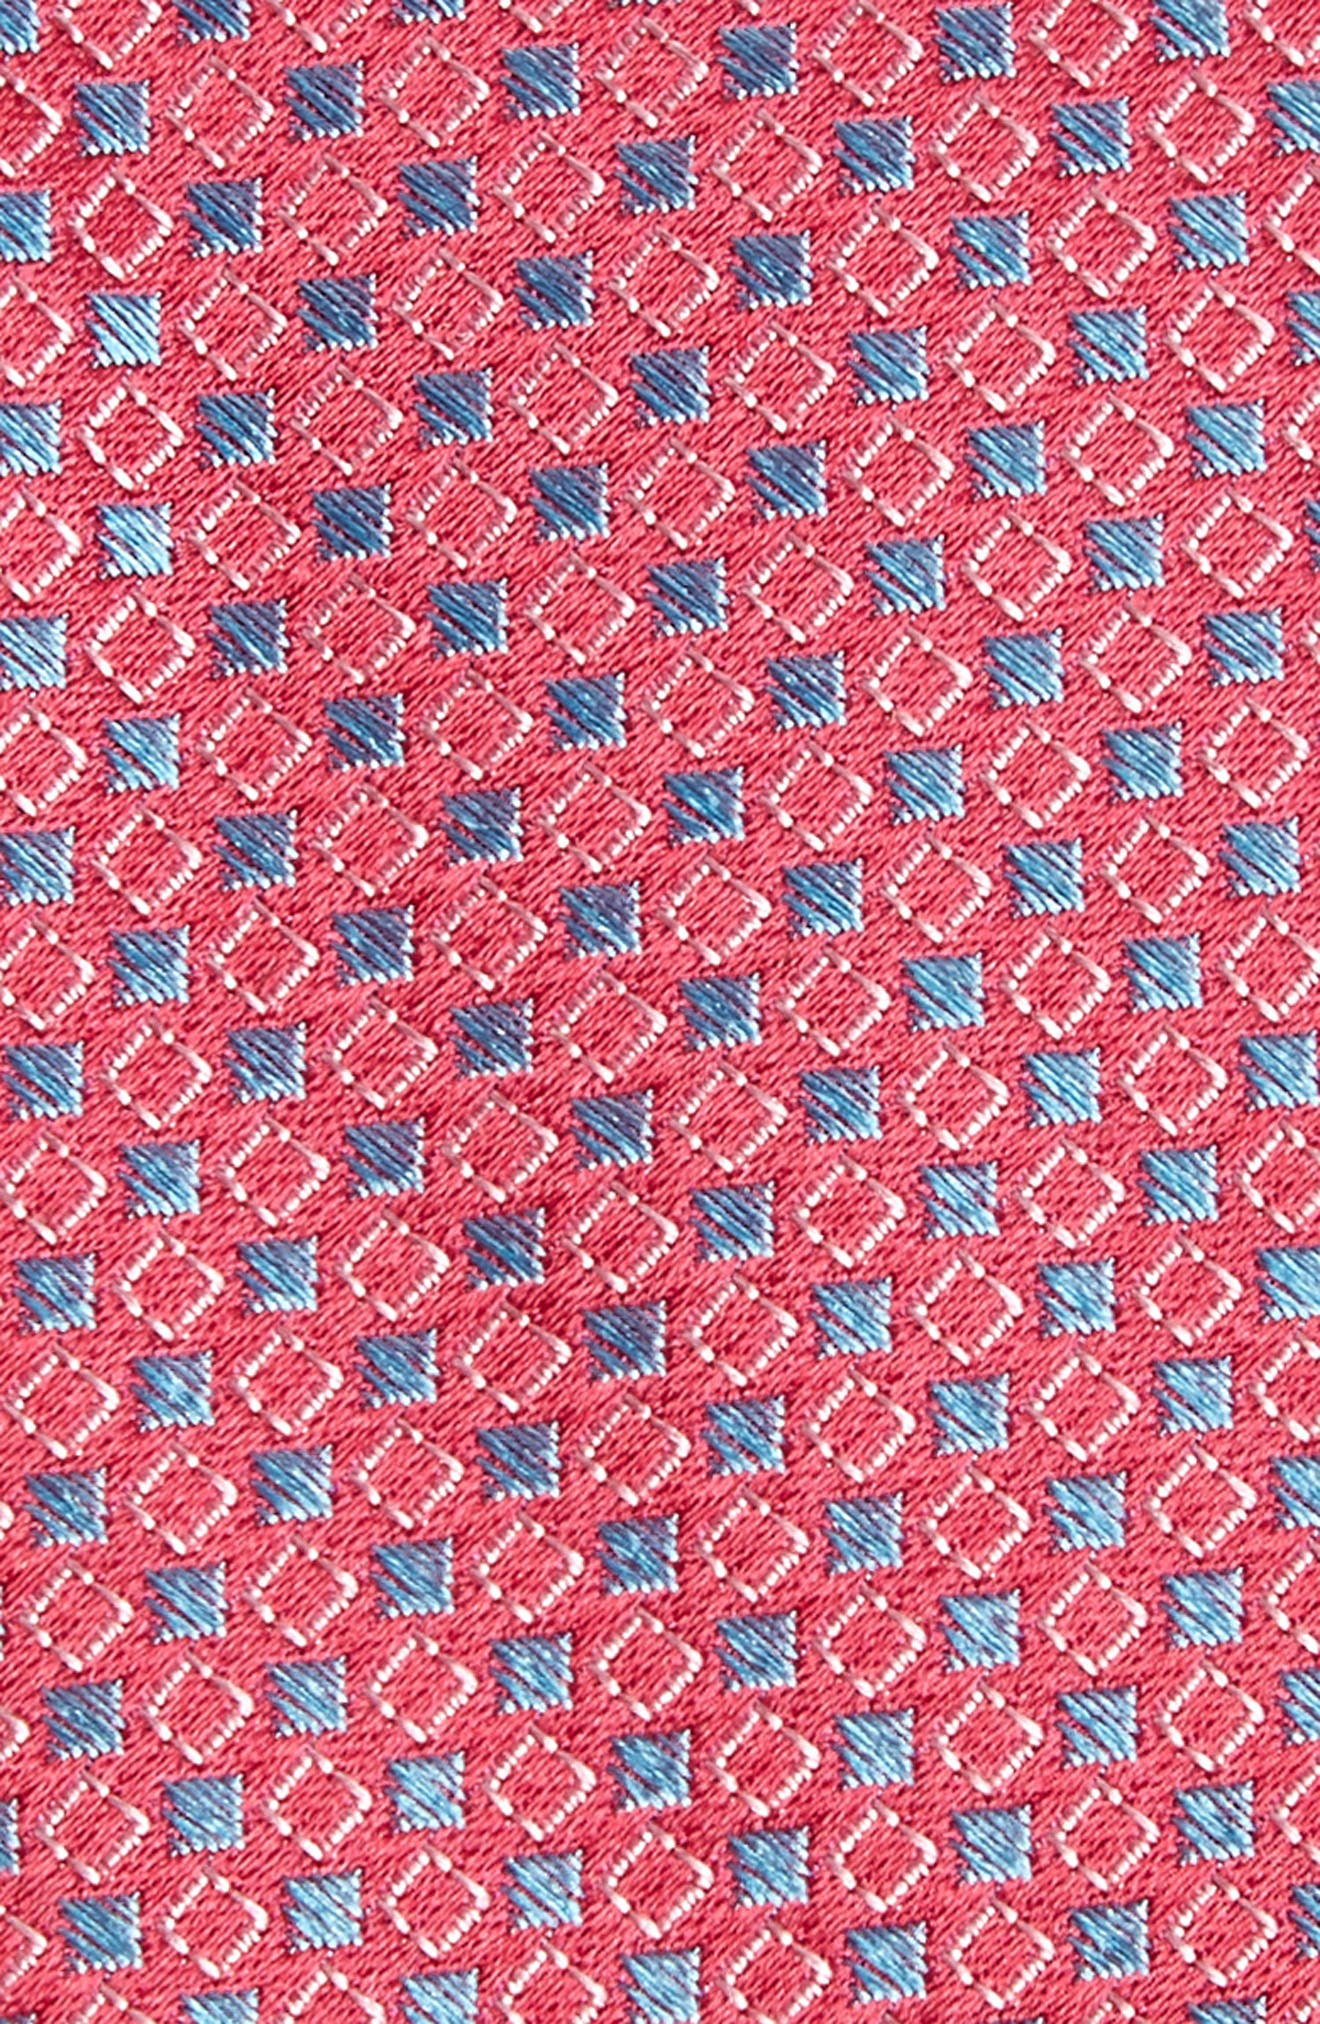 Chad Microdot Silk Tie,                             Alternate thumbnail 16, color,